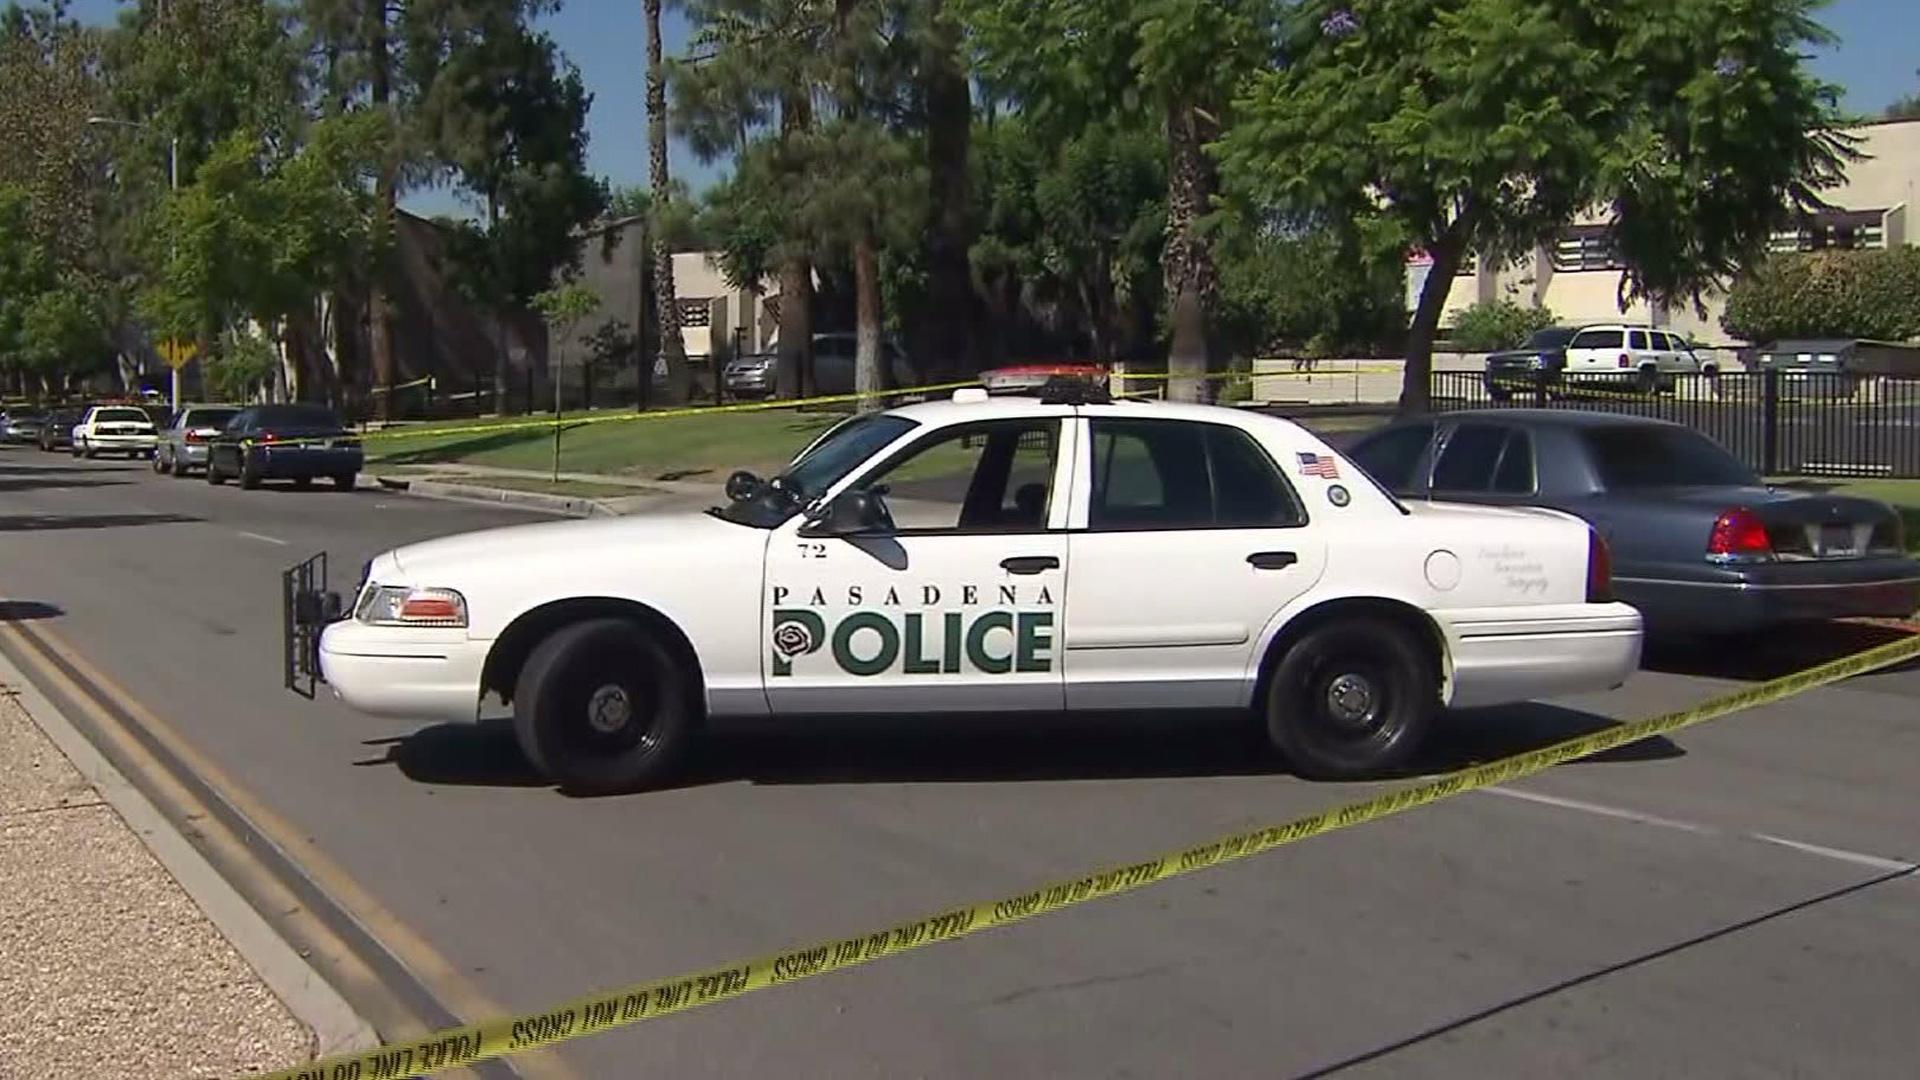 A Pasadena Police Department patrol unit is seen in a file photo. (KTLA)